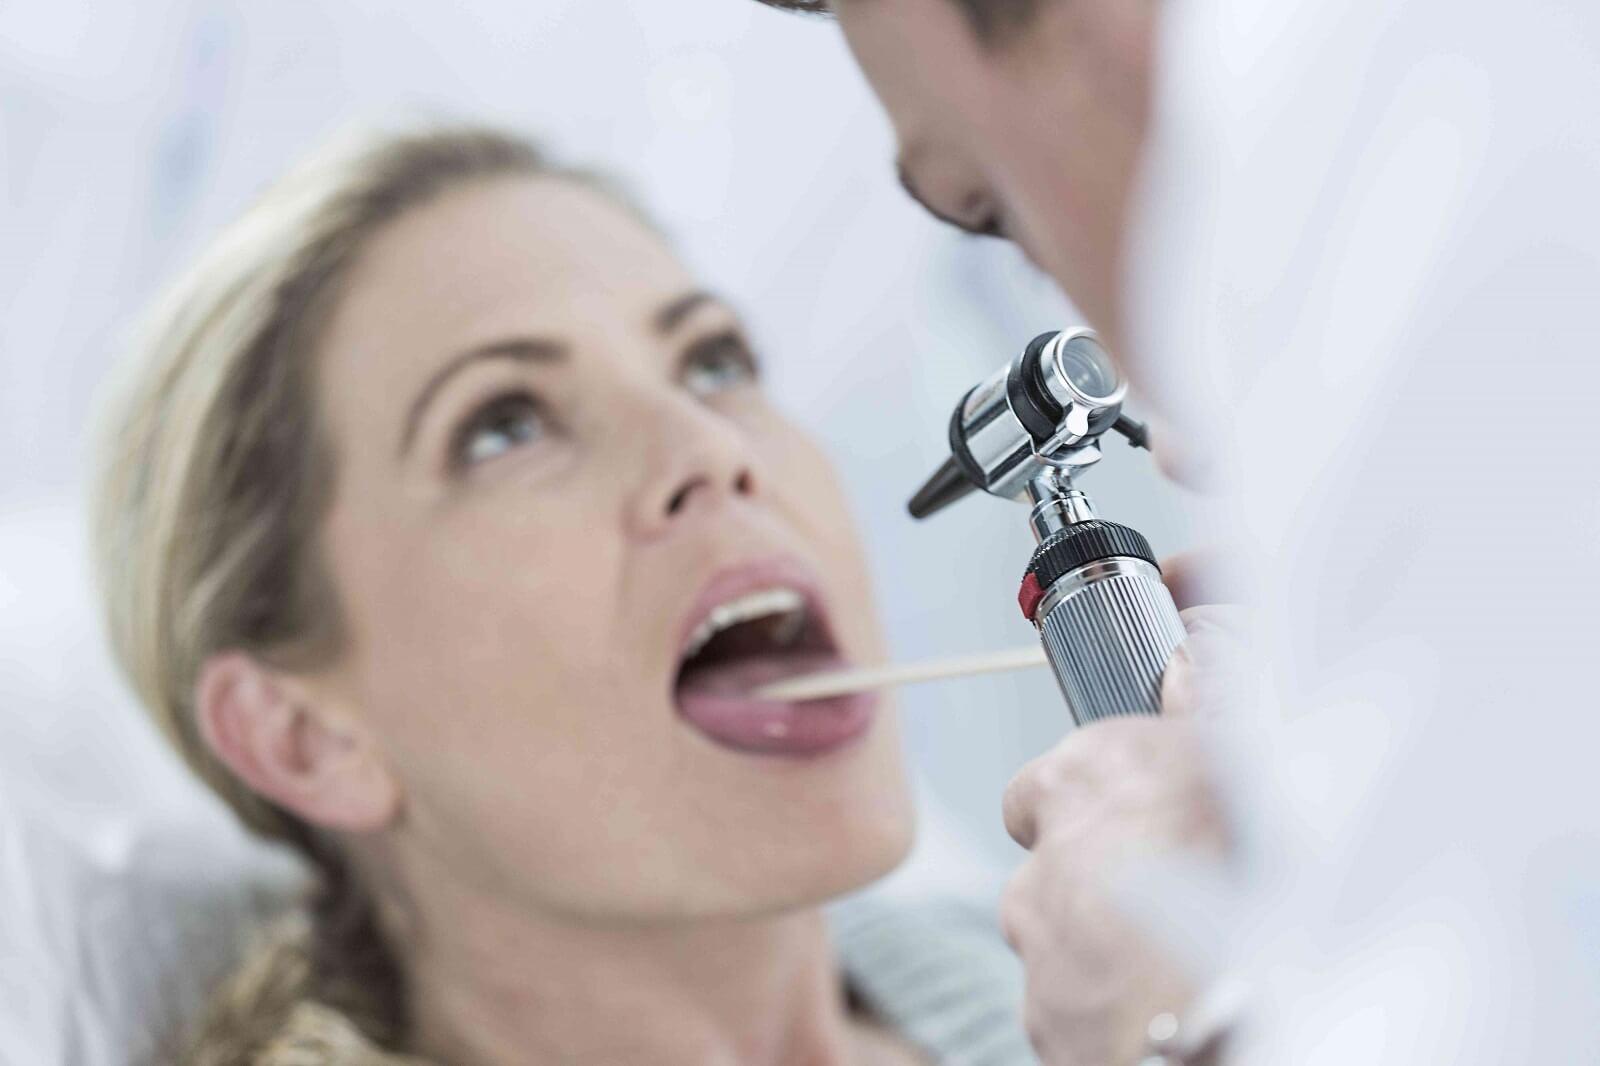 Классификация и лечение хронического тонзиллита